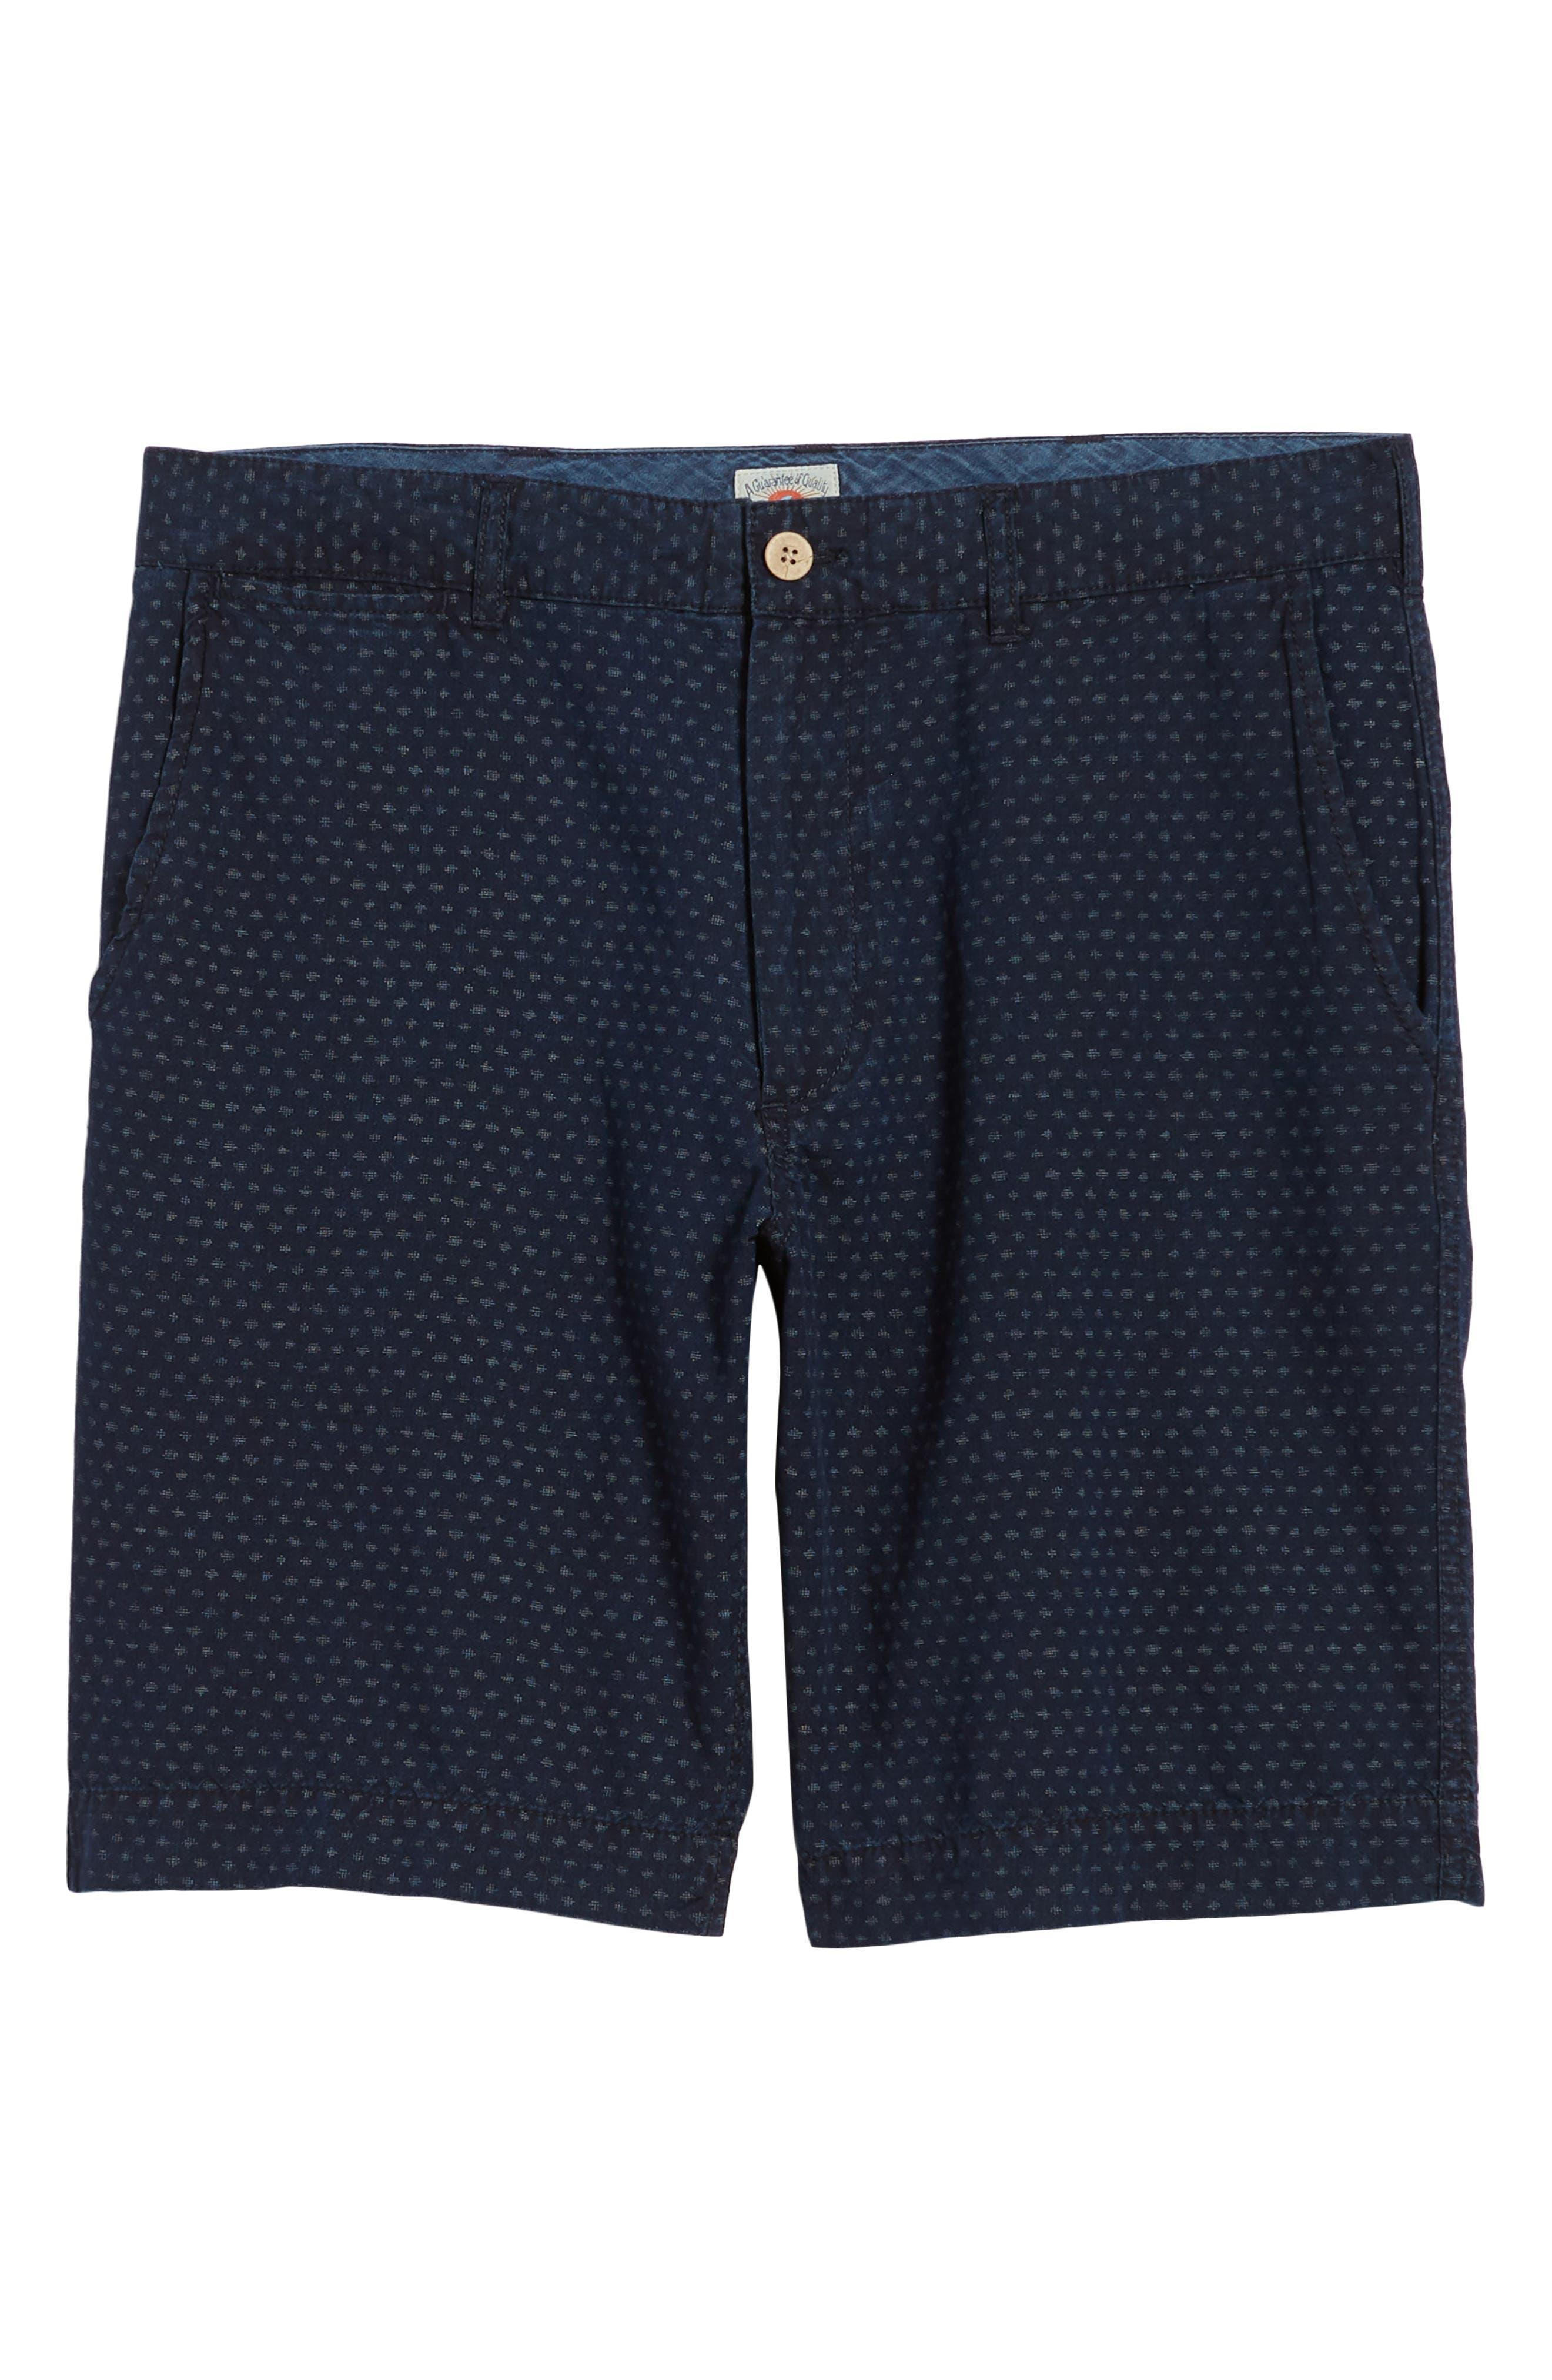 Asbury Shorts,                             Alternate thumbnail 6, color,                             Indigo Fleck